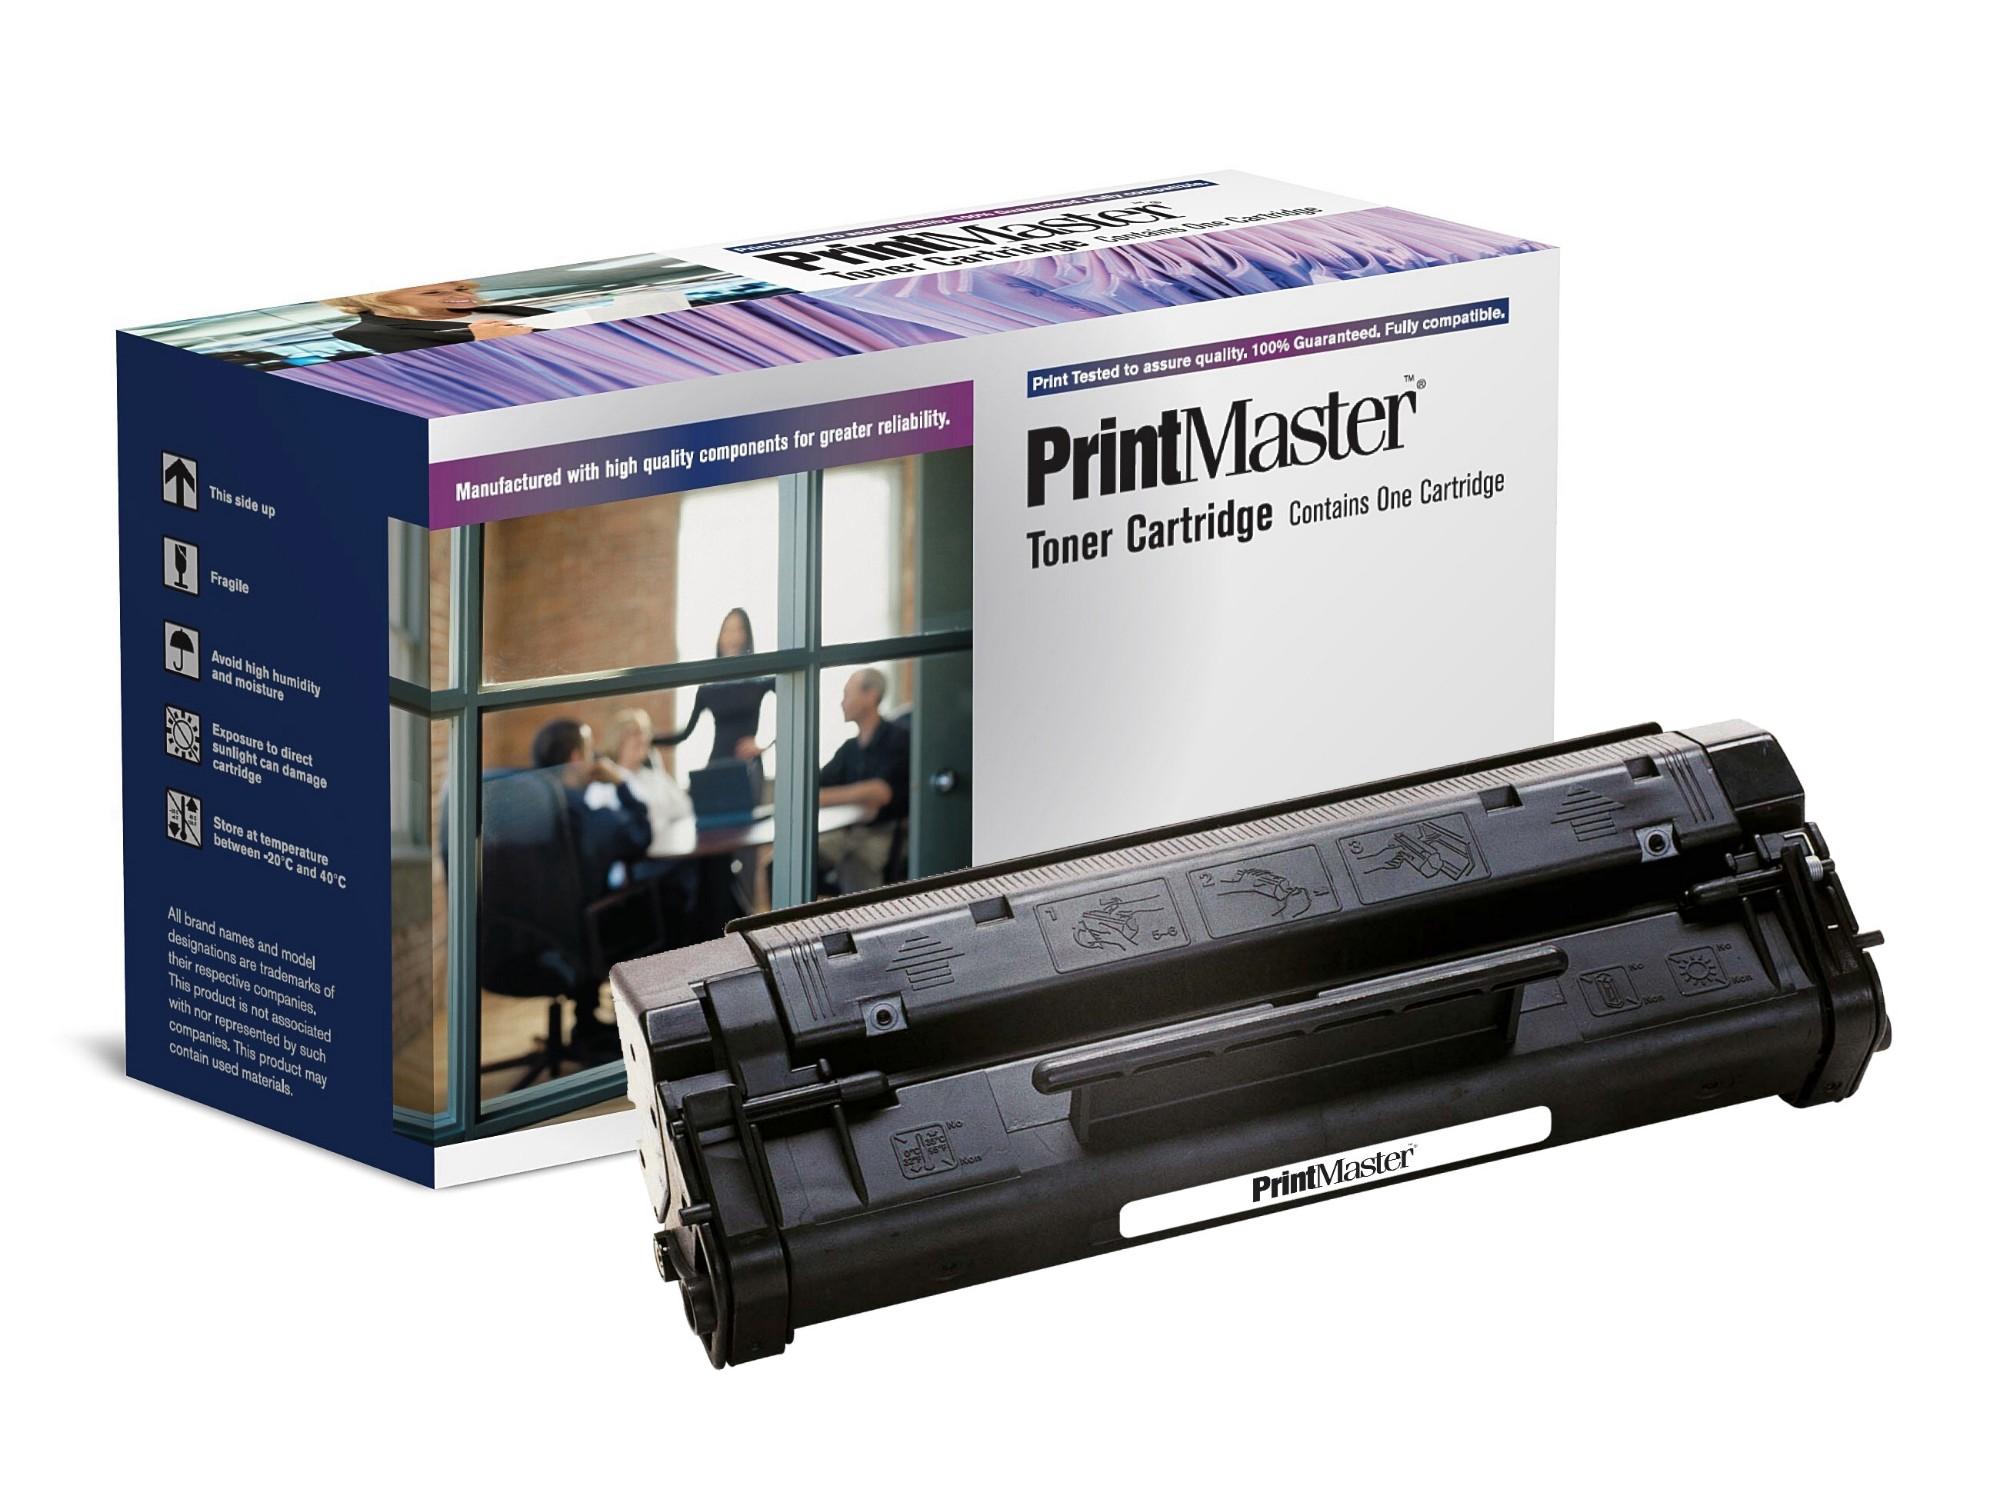 Printmaster Black Toner Cartridge For Hp Laserjet 1100 Cadtrige Canon 810 3200 Serie Lbp 1110 Se